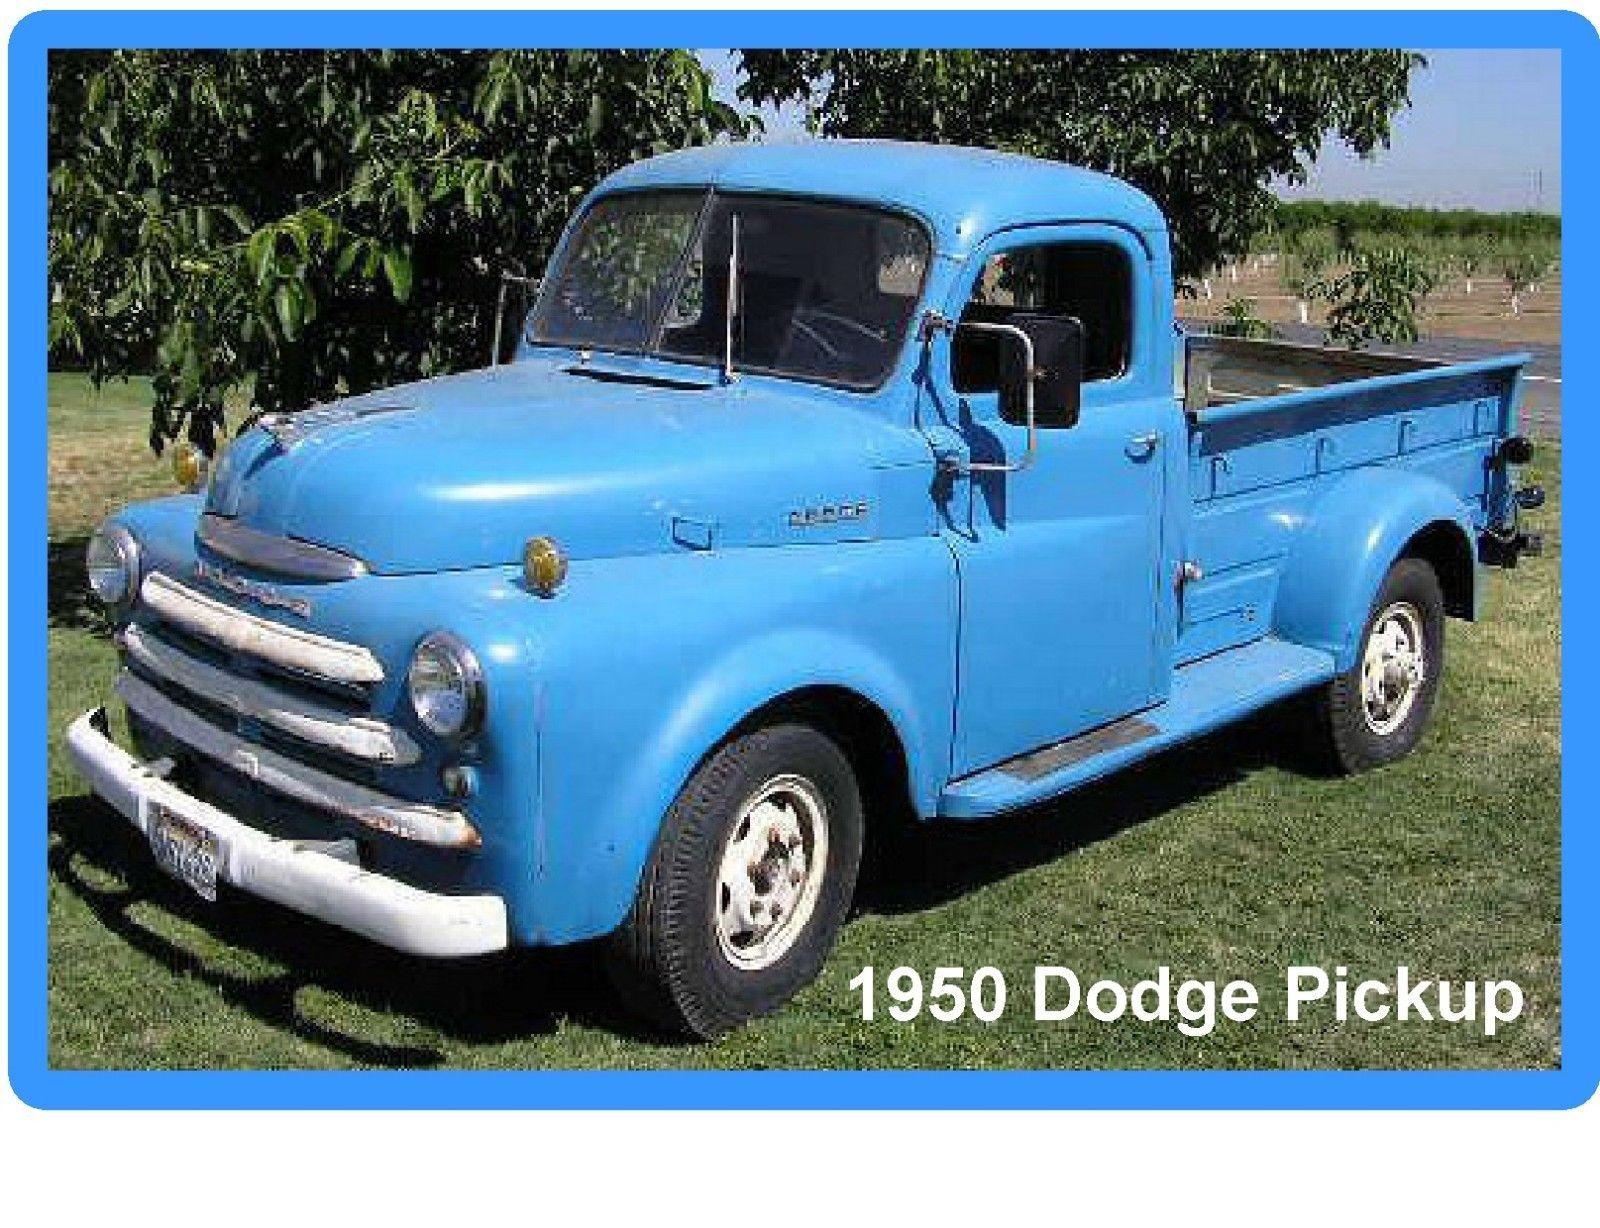 1950 Dodge Pickup Refrigerator Tool Box Magnet Man Cave Dodge Pickup Dodge Old Dodge Trucks